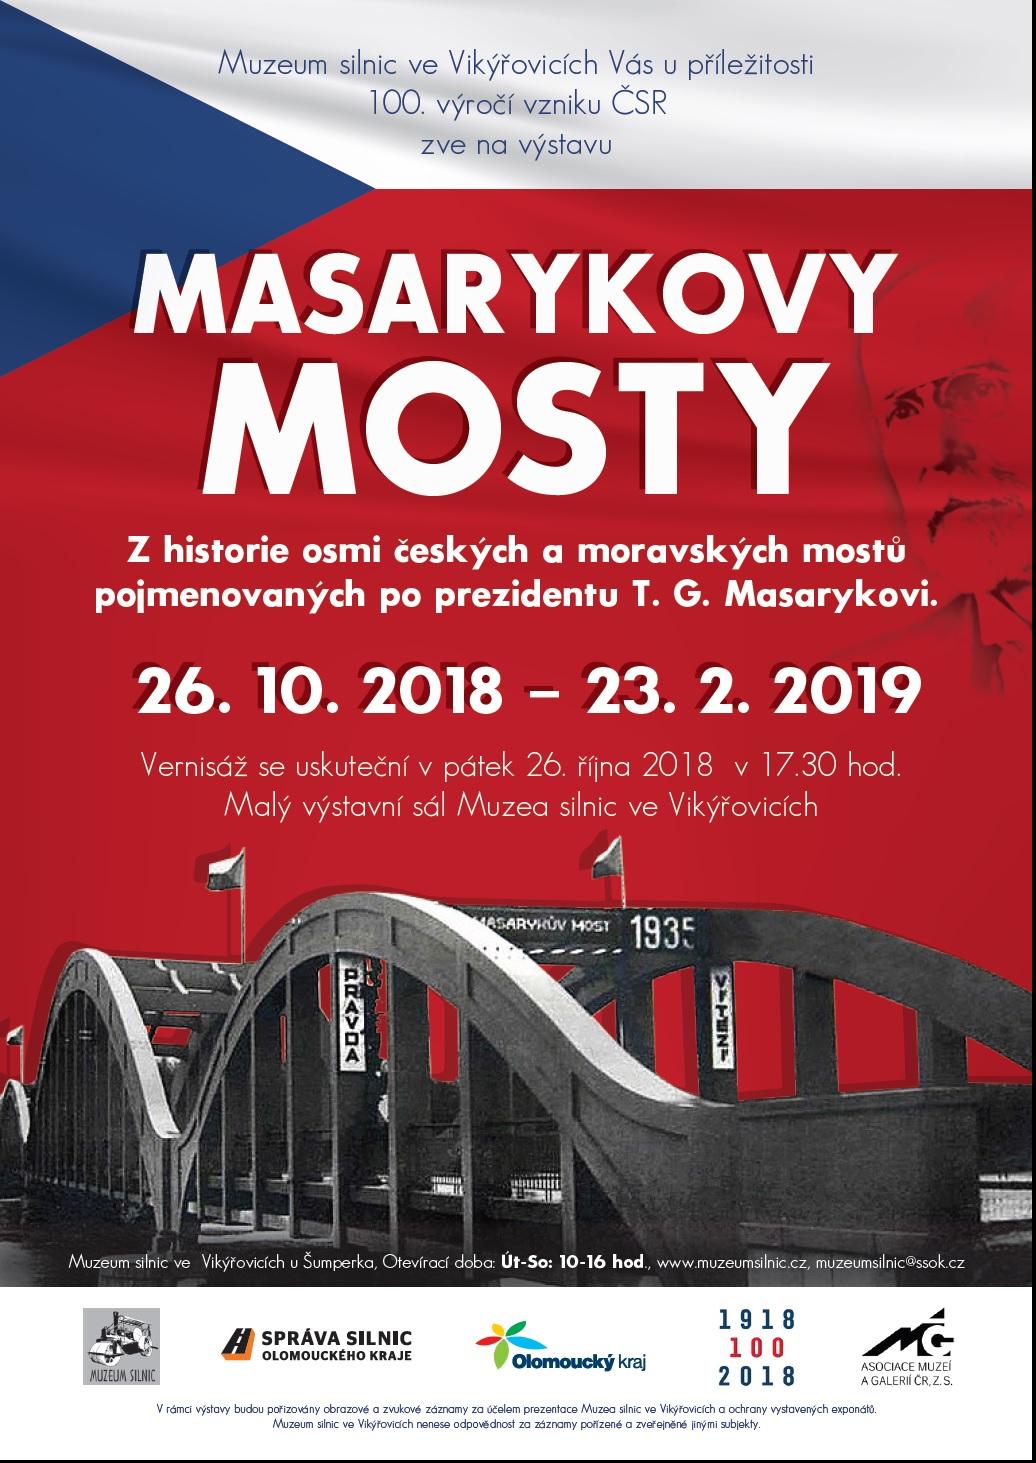 Masarykovy mosty